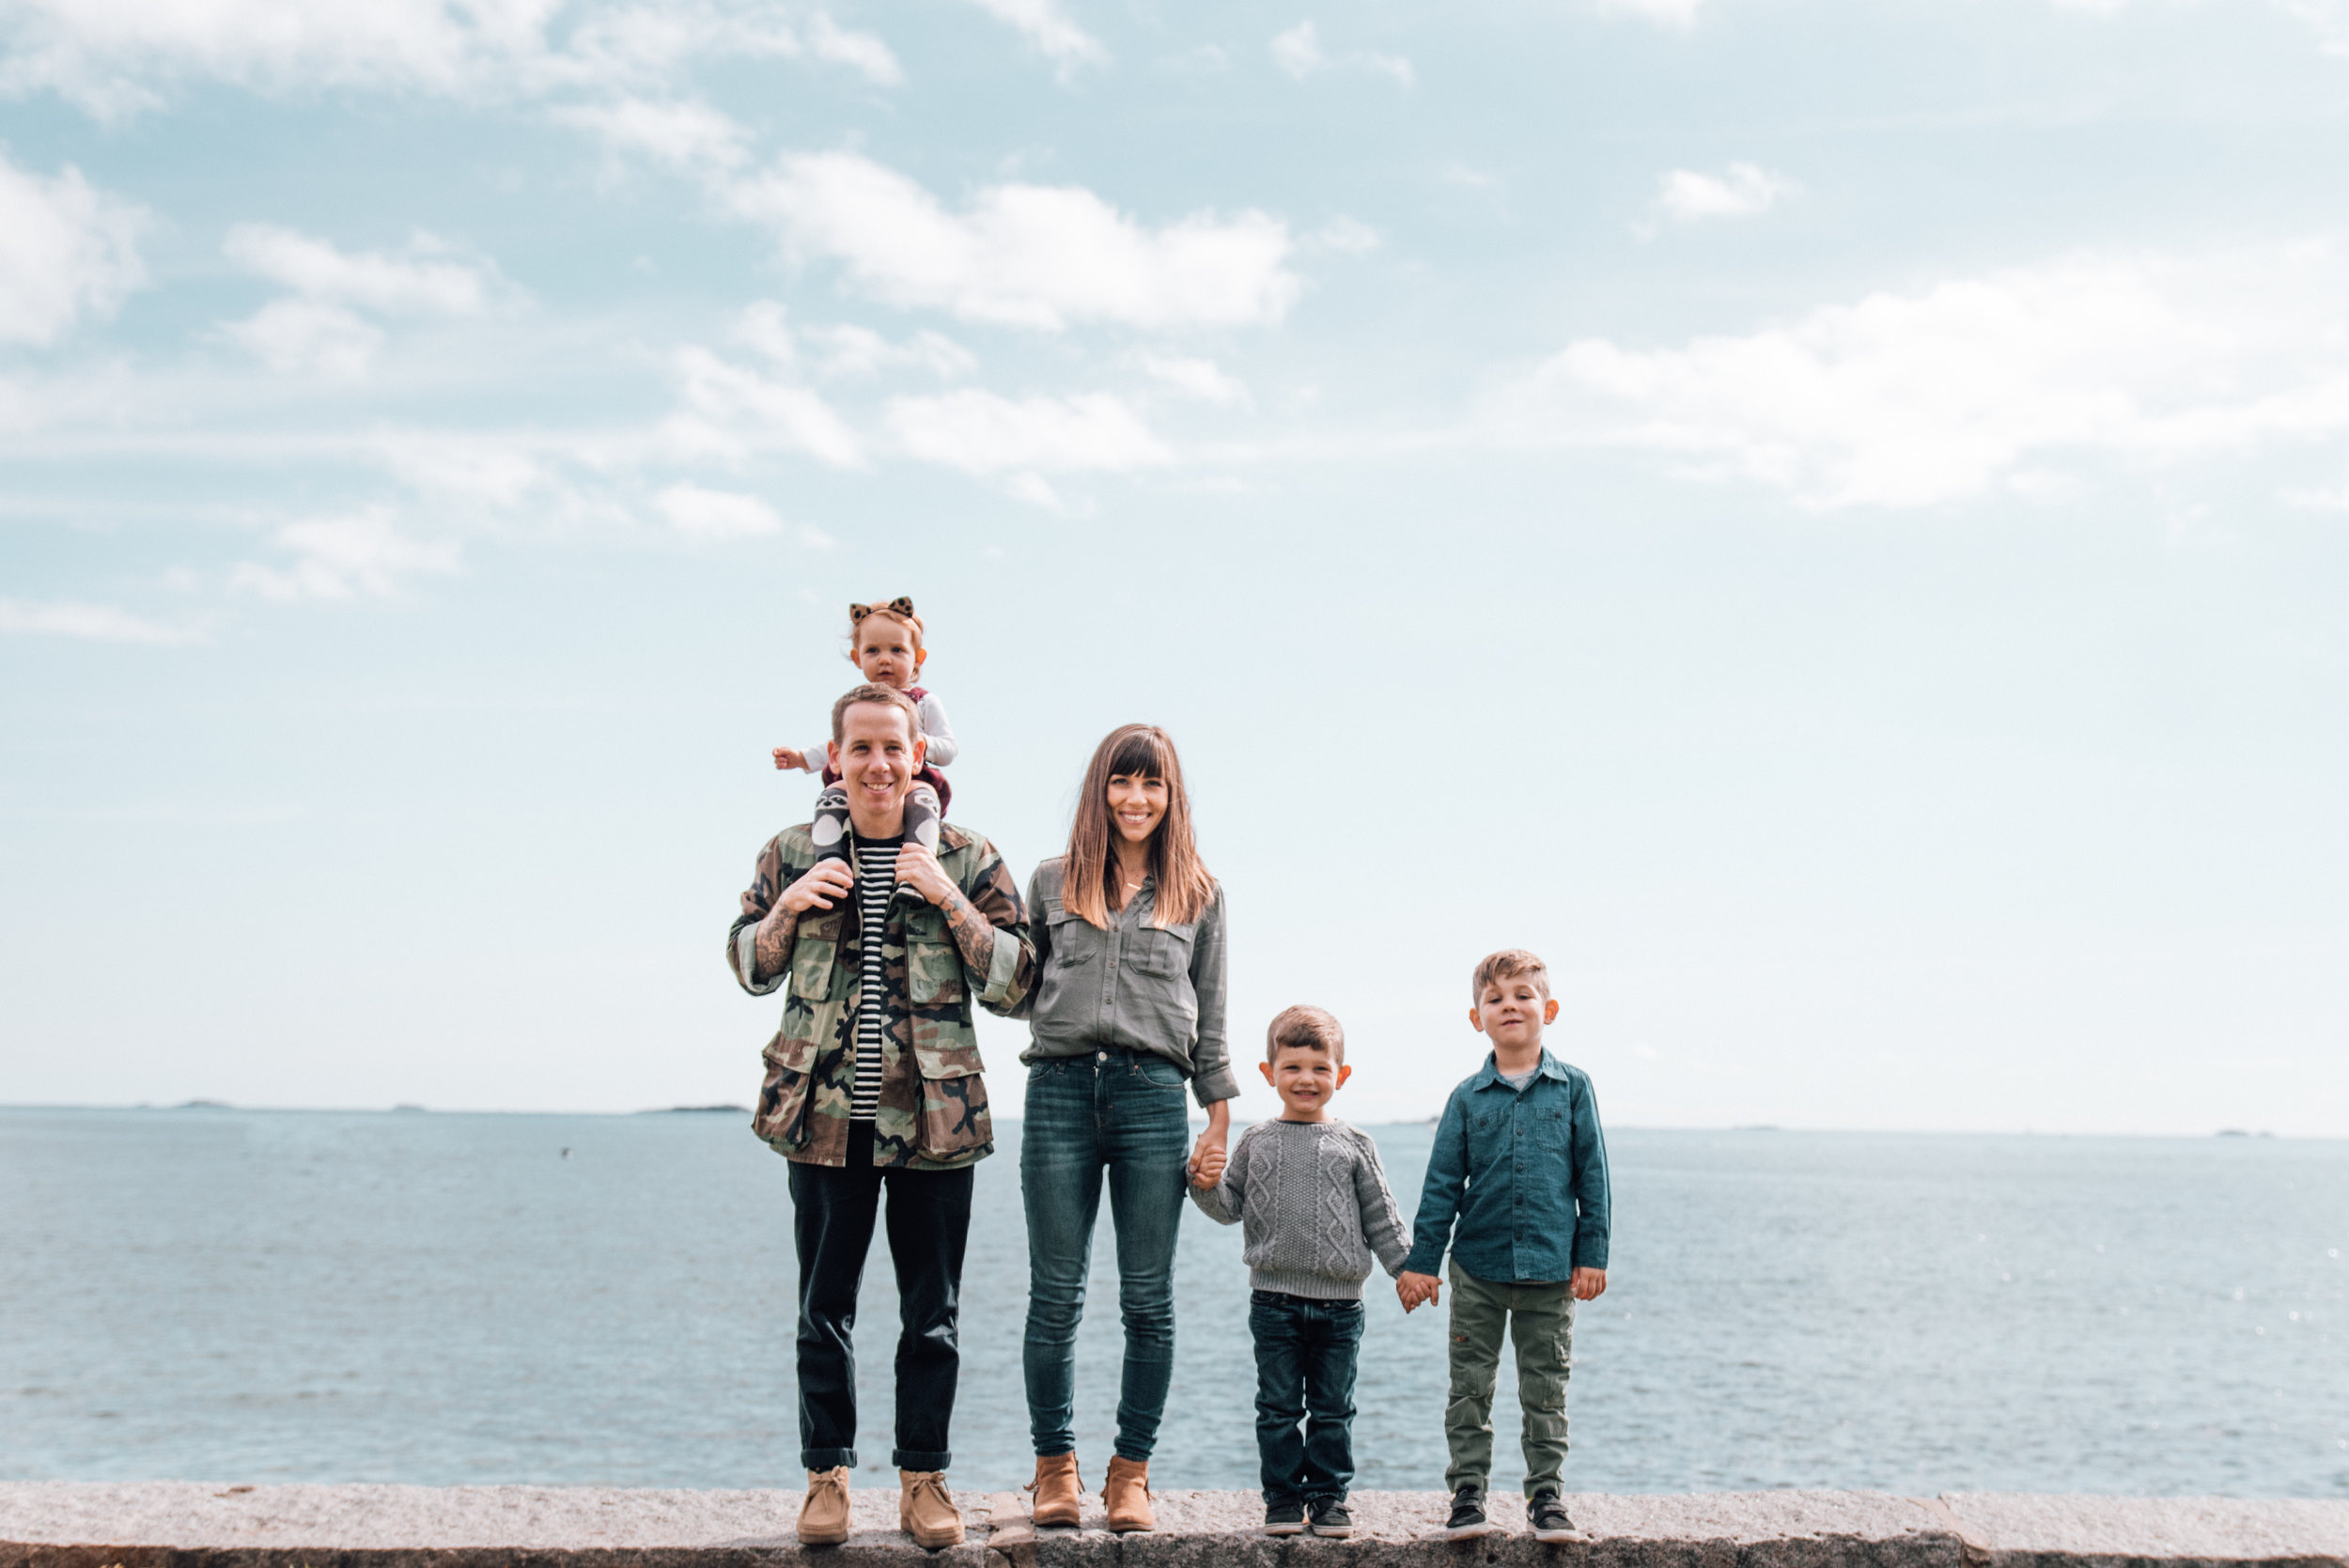 Boston Family Session Near the Ocean